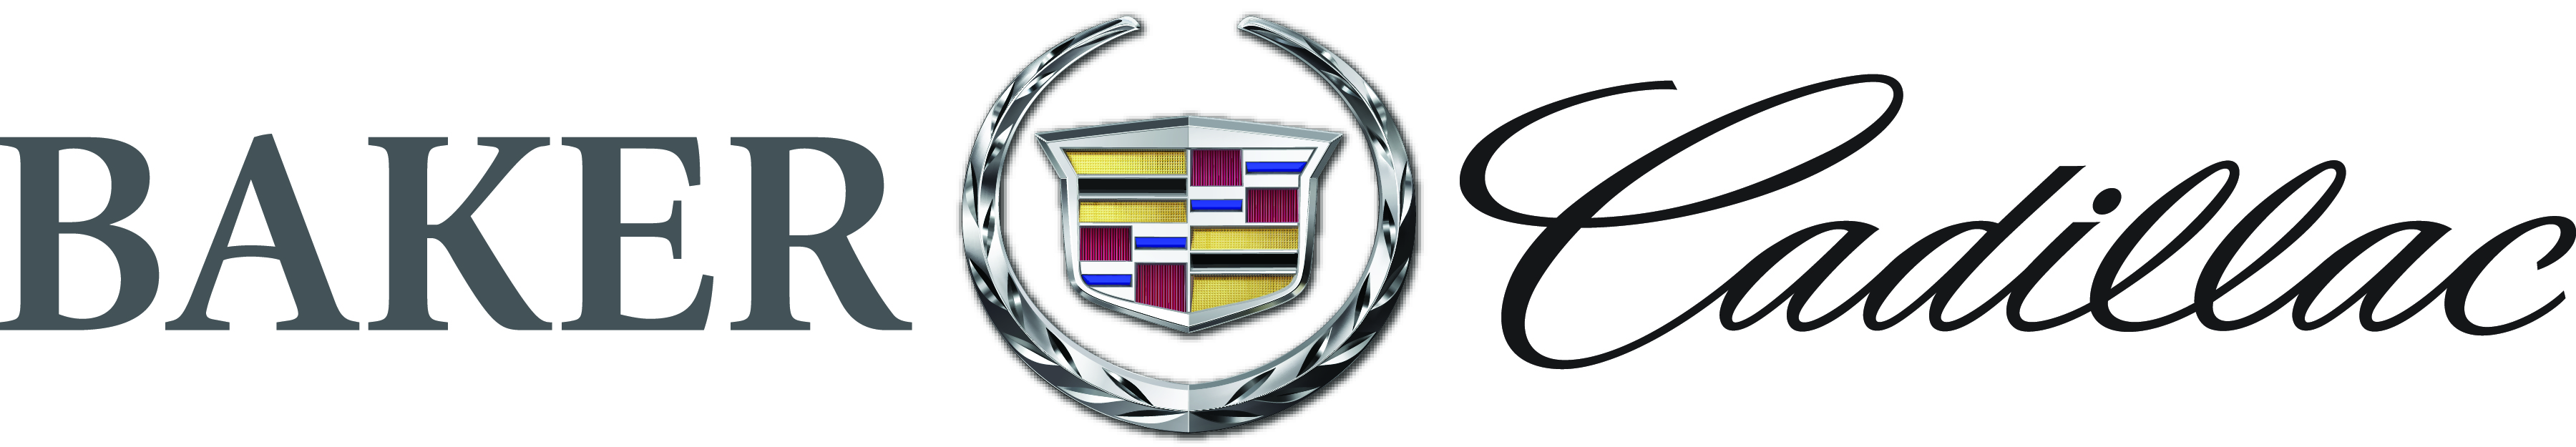 Baker Cadillac Sponsors Nkf Cadillac Golf Classic